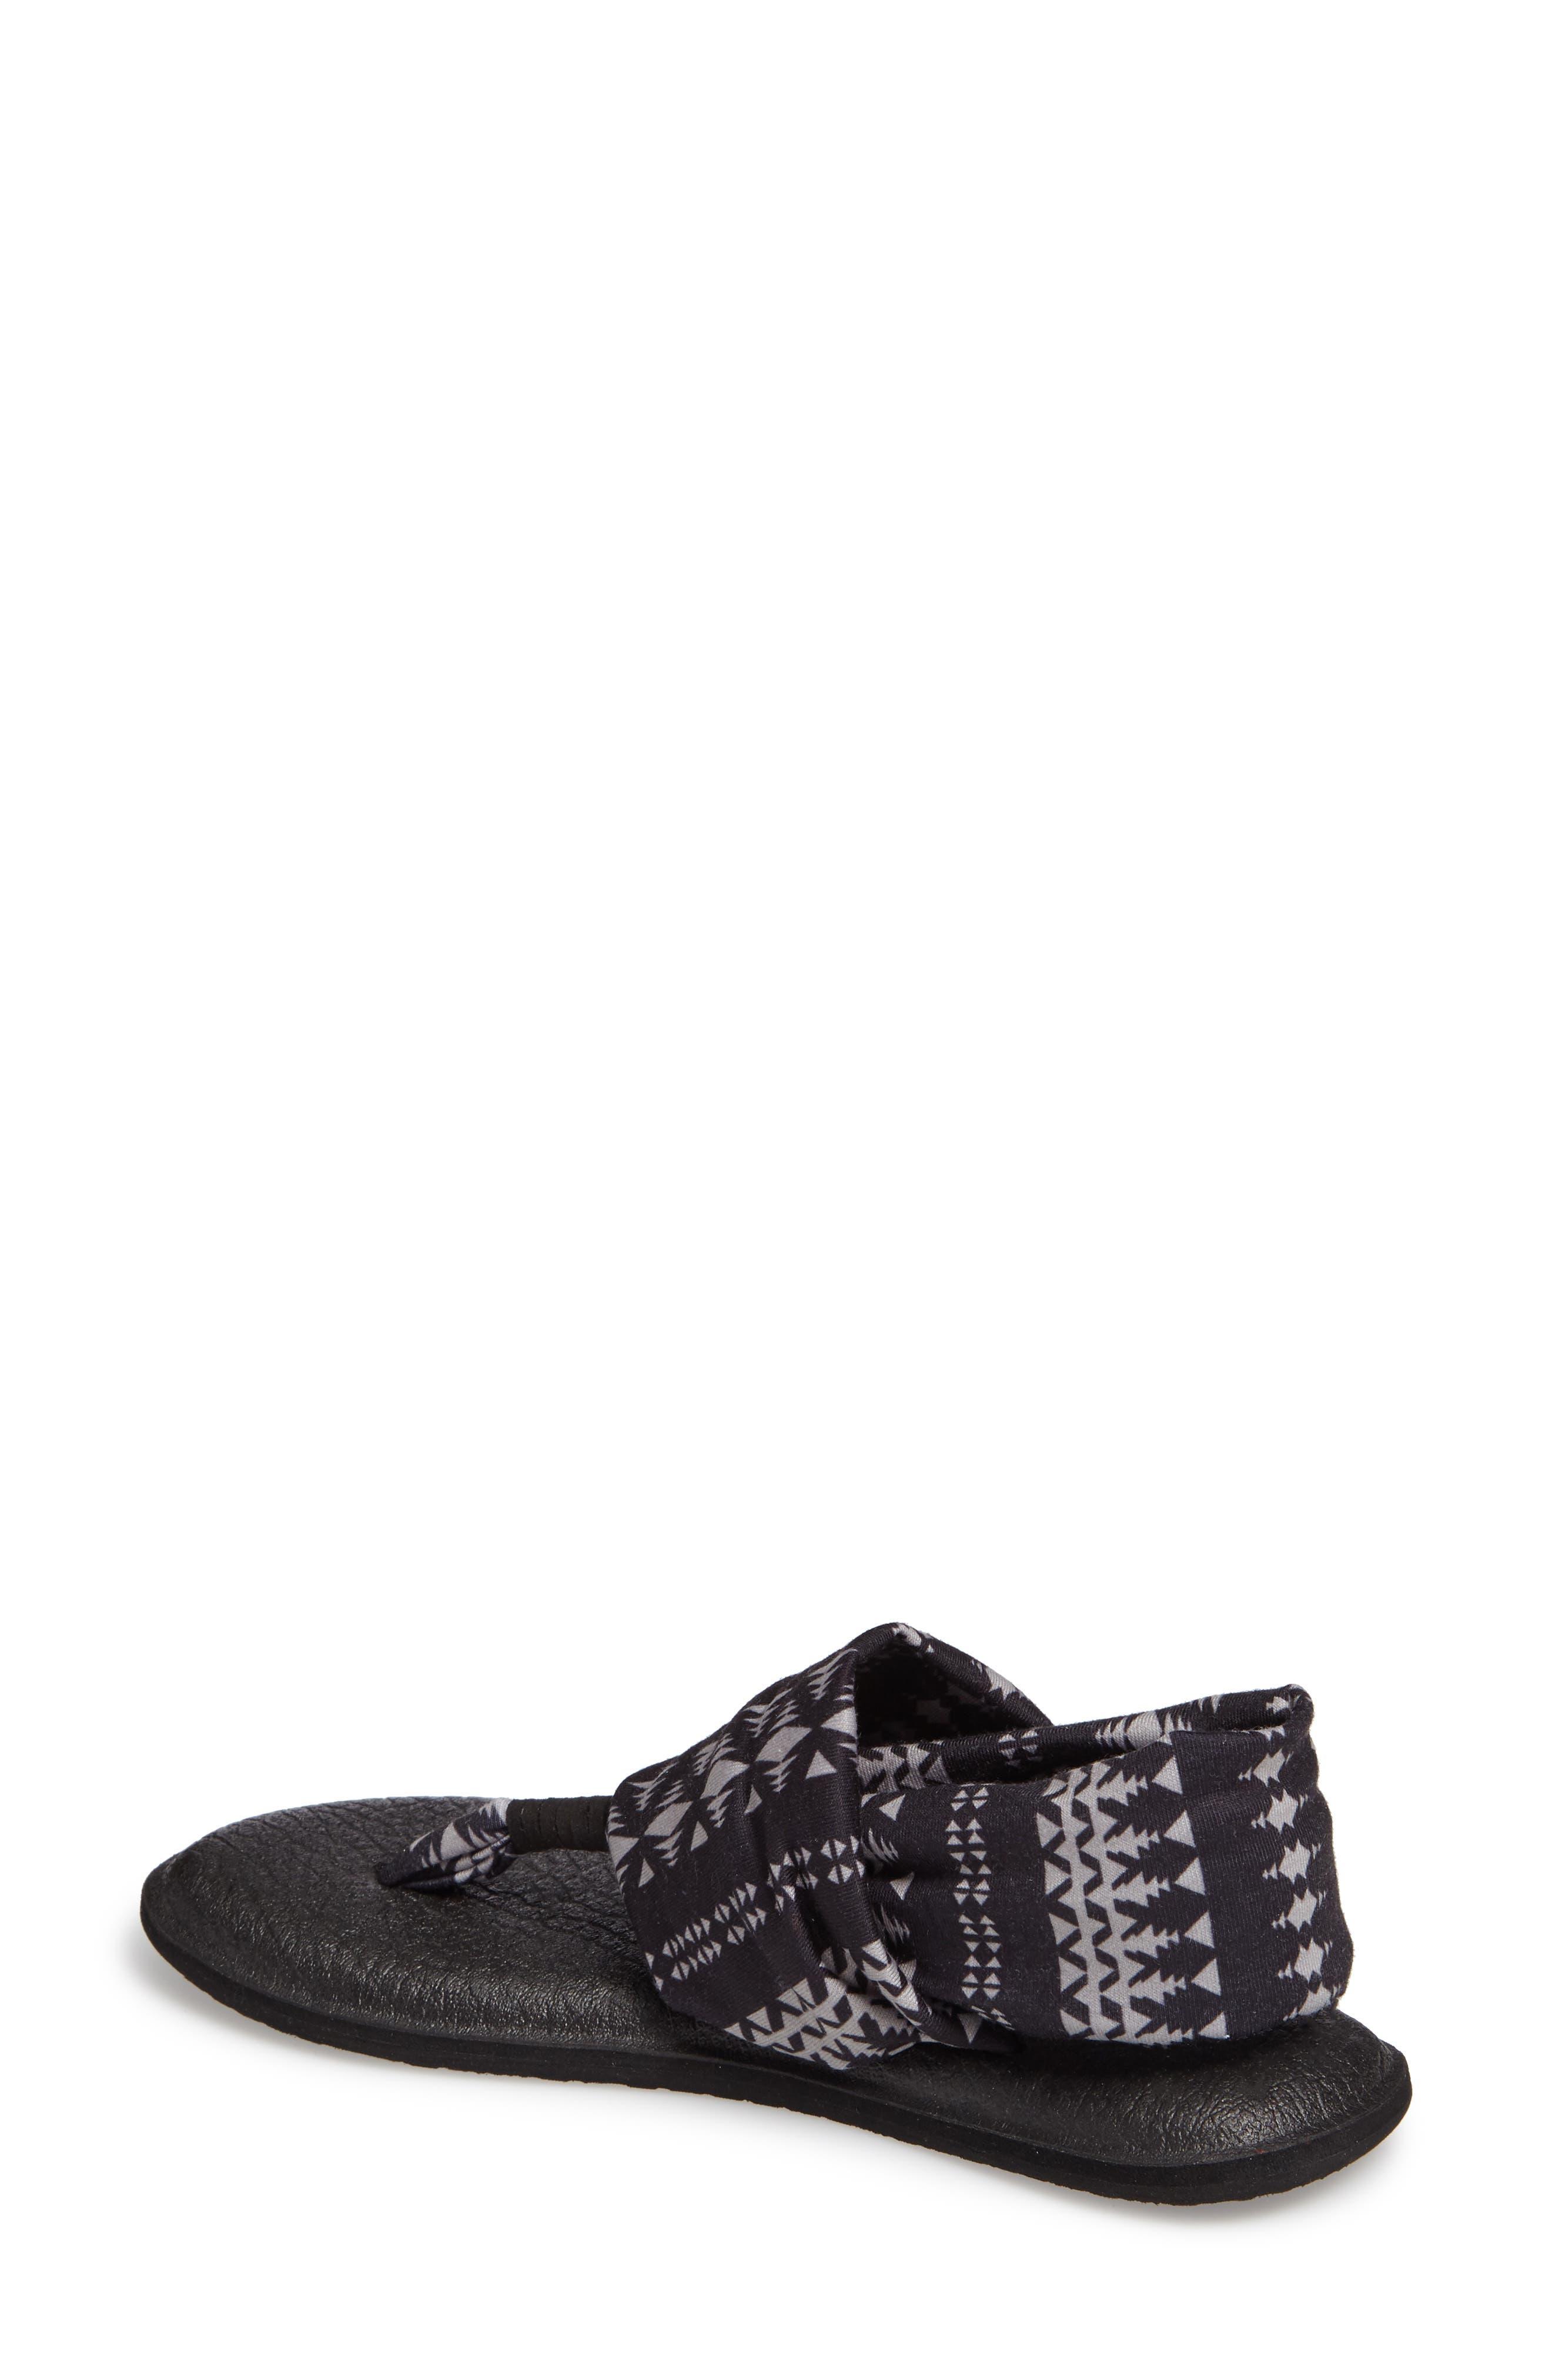 'Yoga Sling 2' Sandal,                             Alternate thumbnail 2, color,                             BLACK TRIBAL